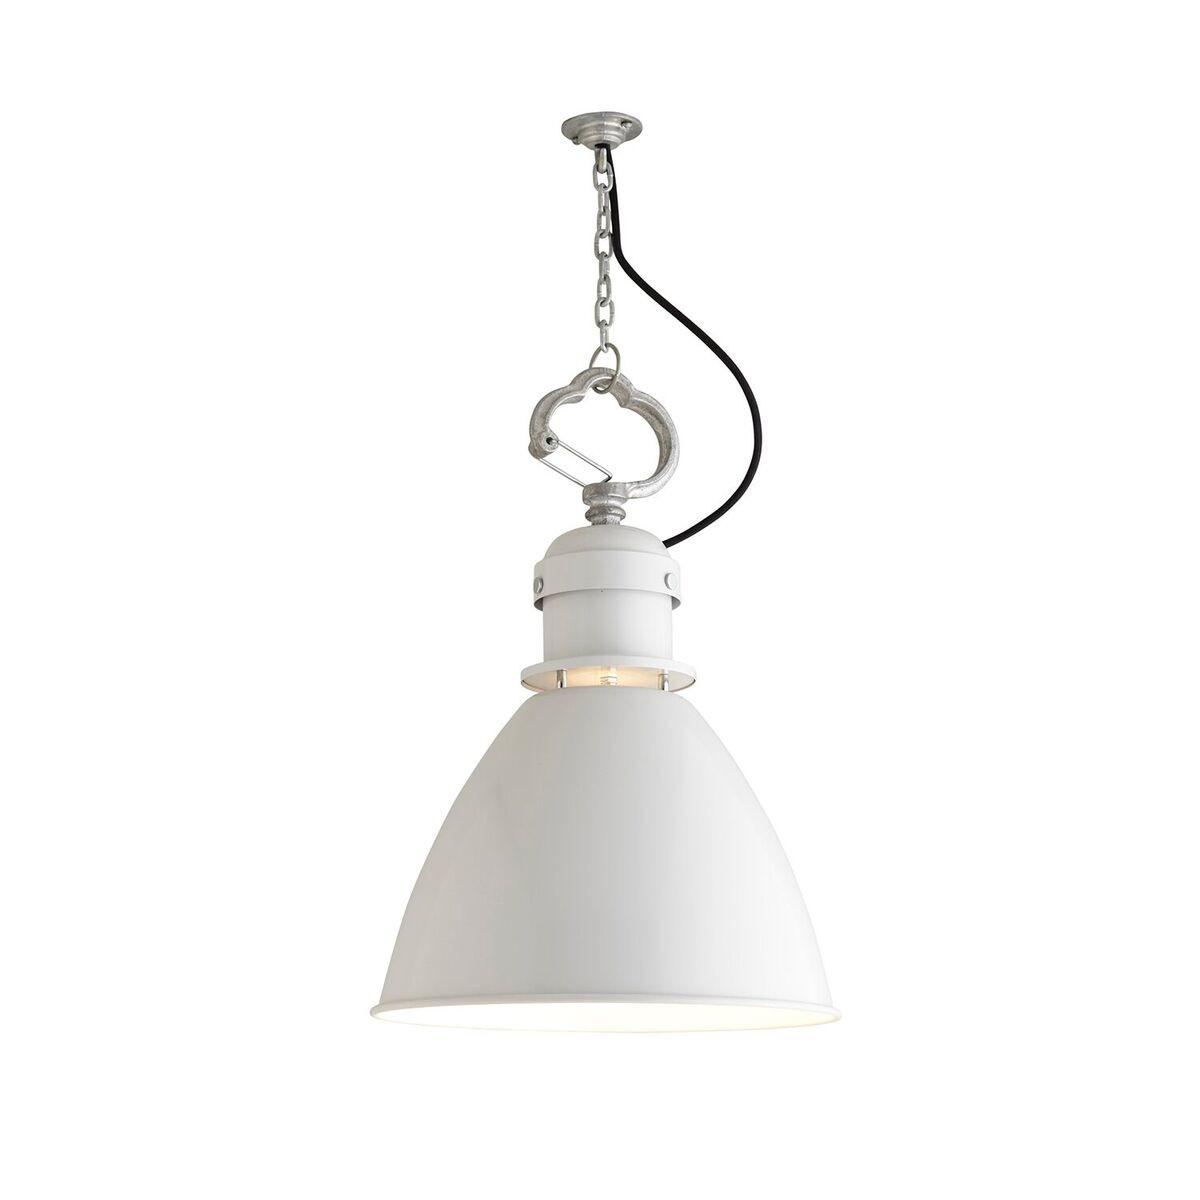 7380 Pendant Light Light Grey, Small